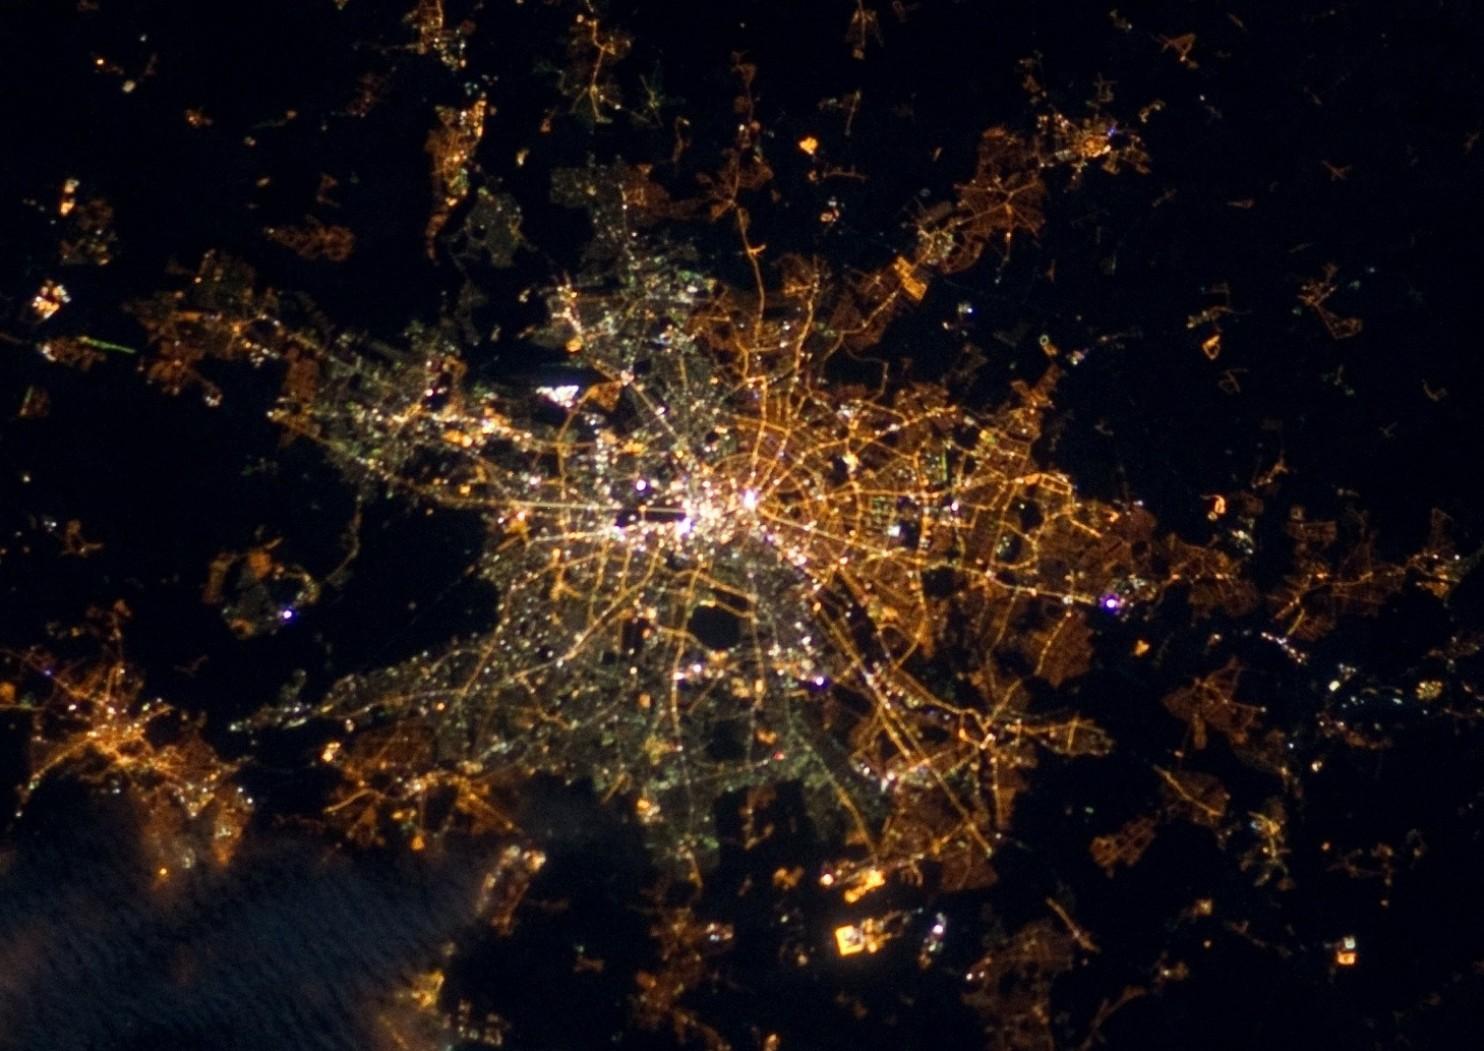 Vista espacial de Berlín, de noche